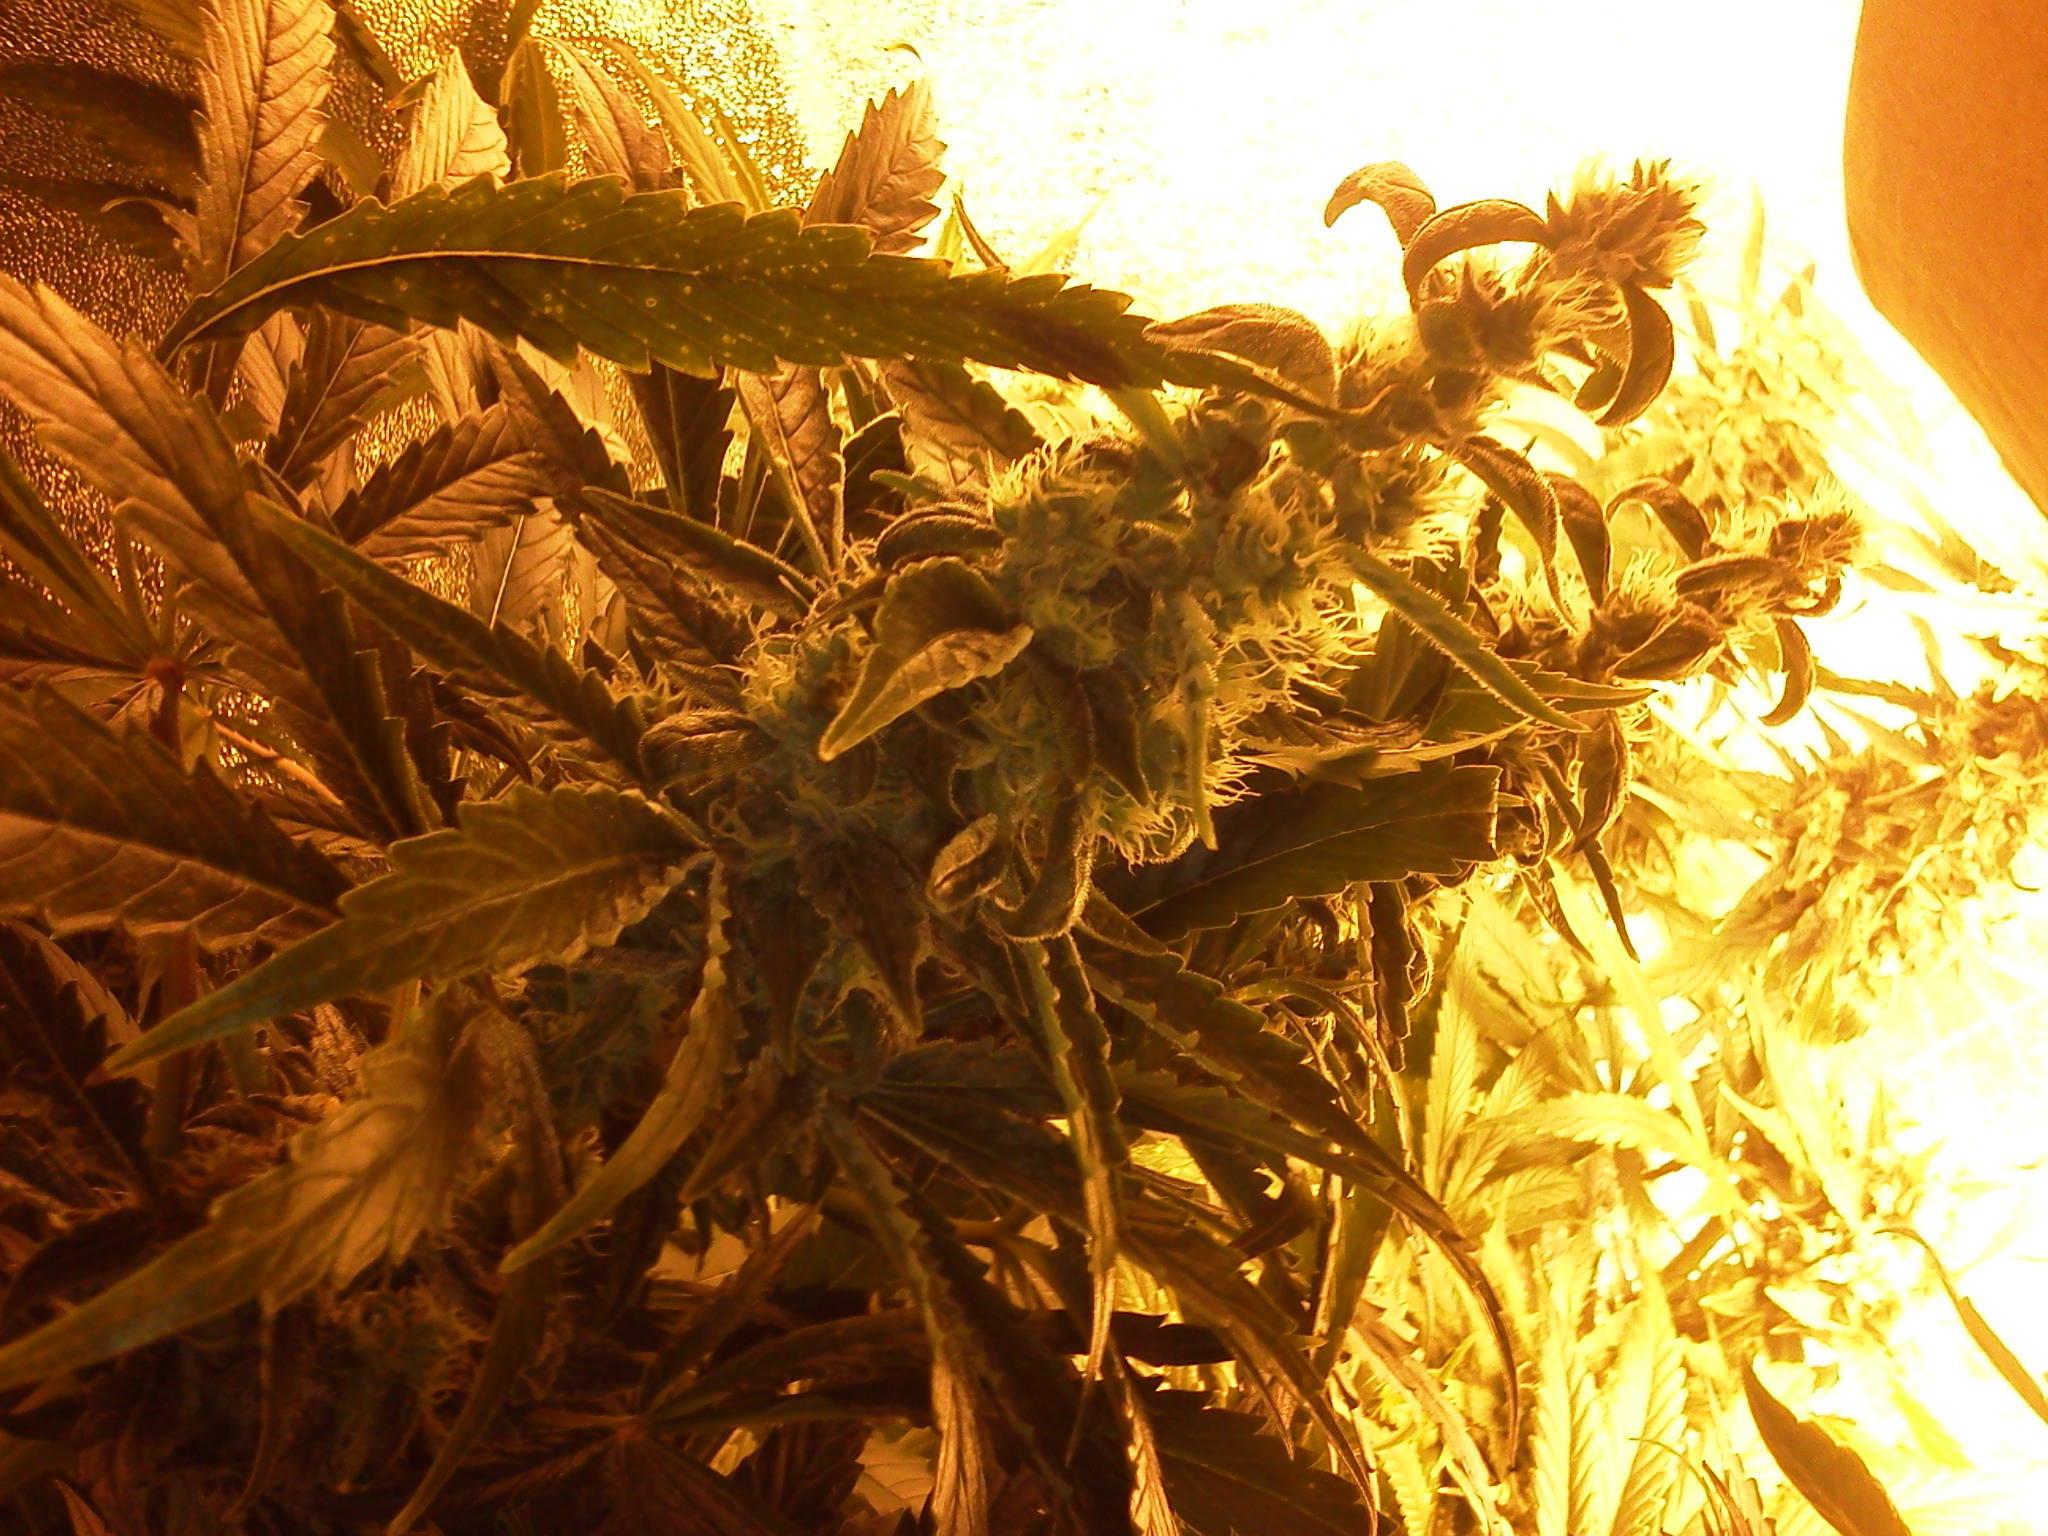 1000w HPS Topfeed DWC 4x4 Tent Grow Log w/ pics! (harvest 6/30